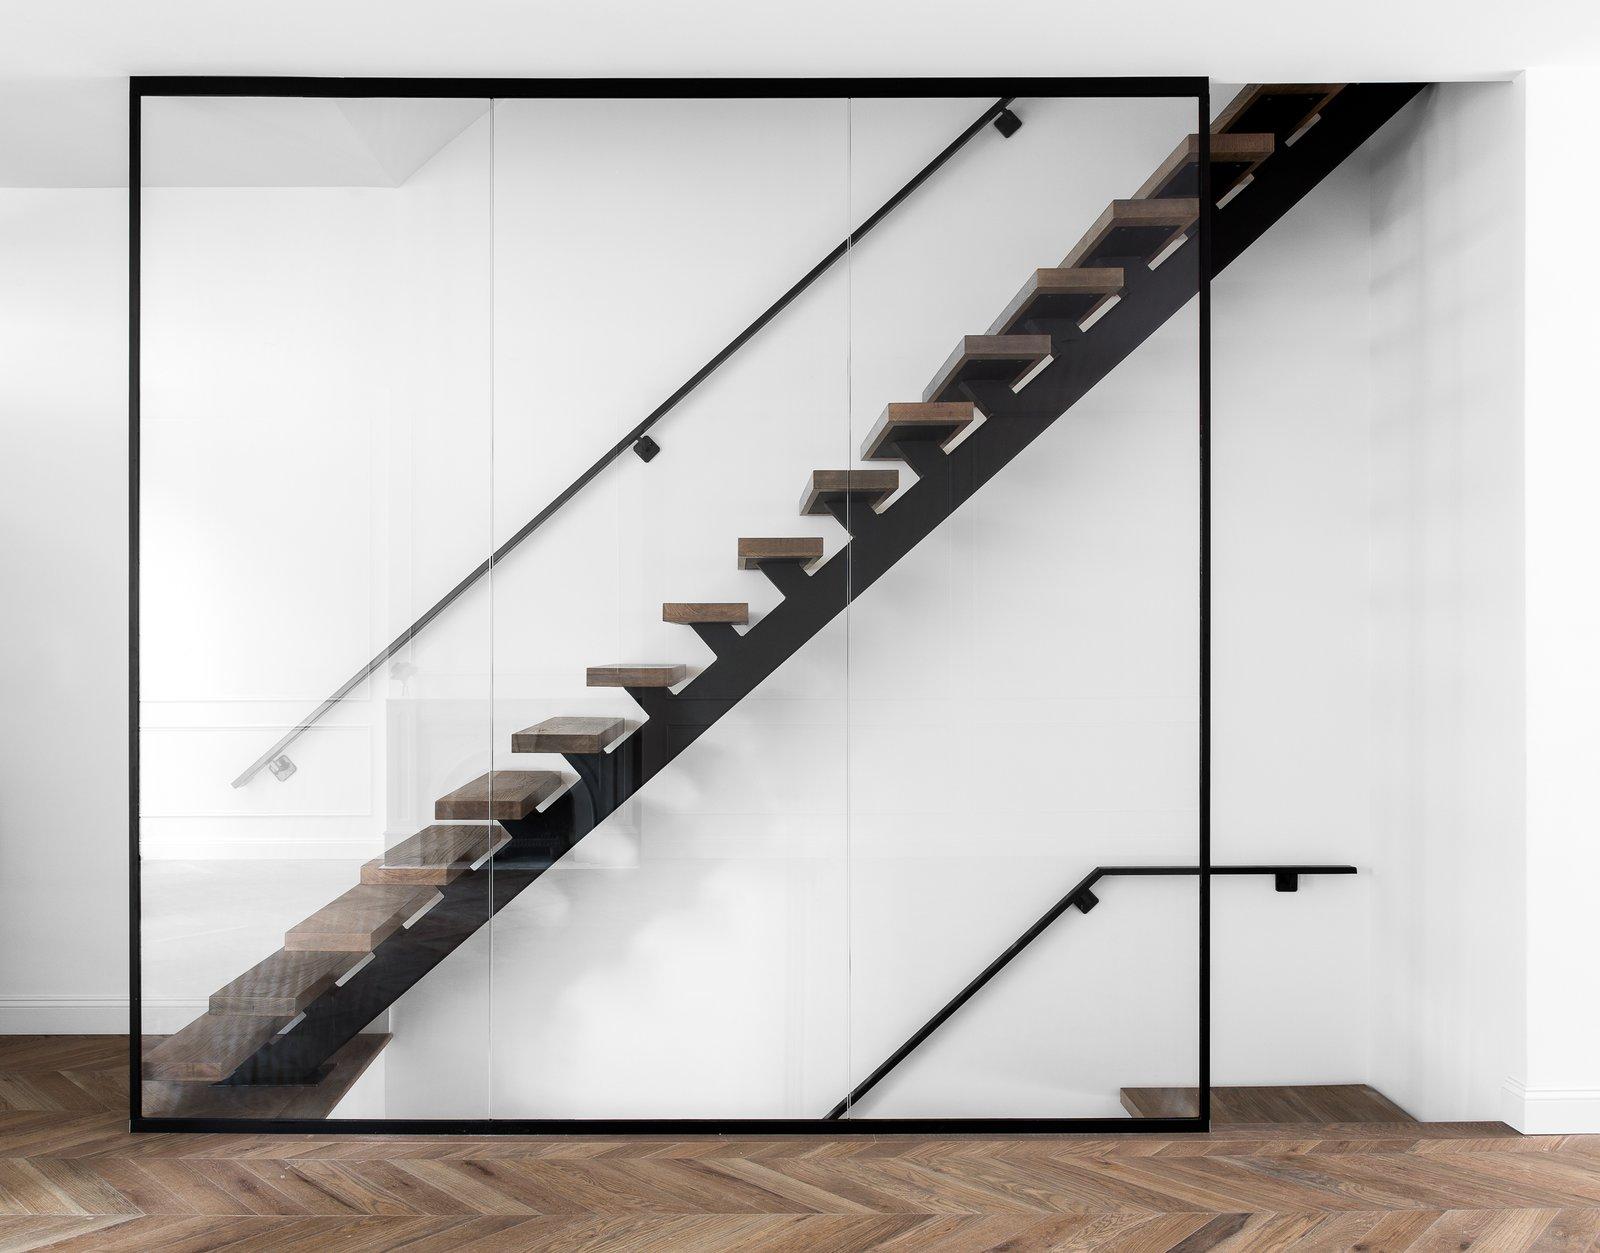 Staircase, Metal Railing, Wood Tread, and Glass Railing  Boerum Hill Brownstone